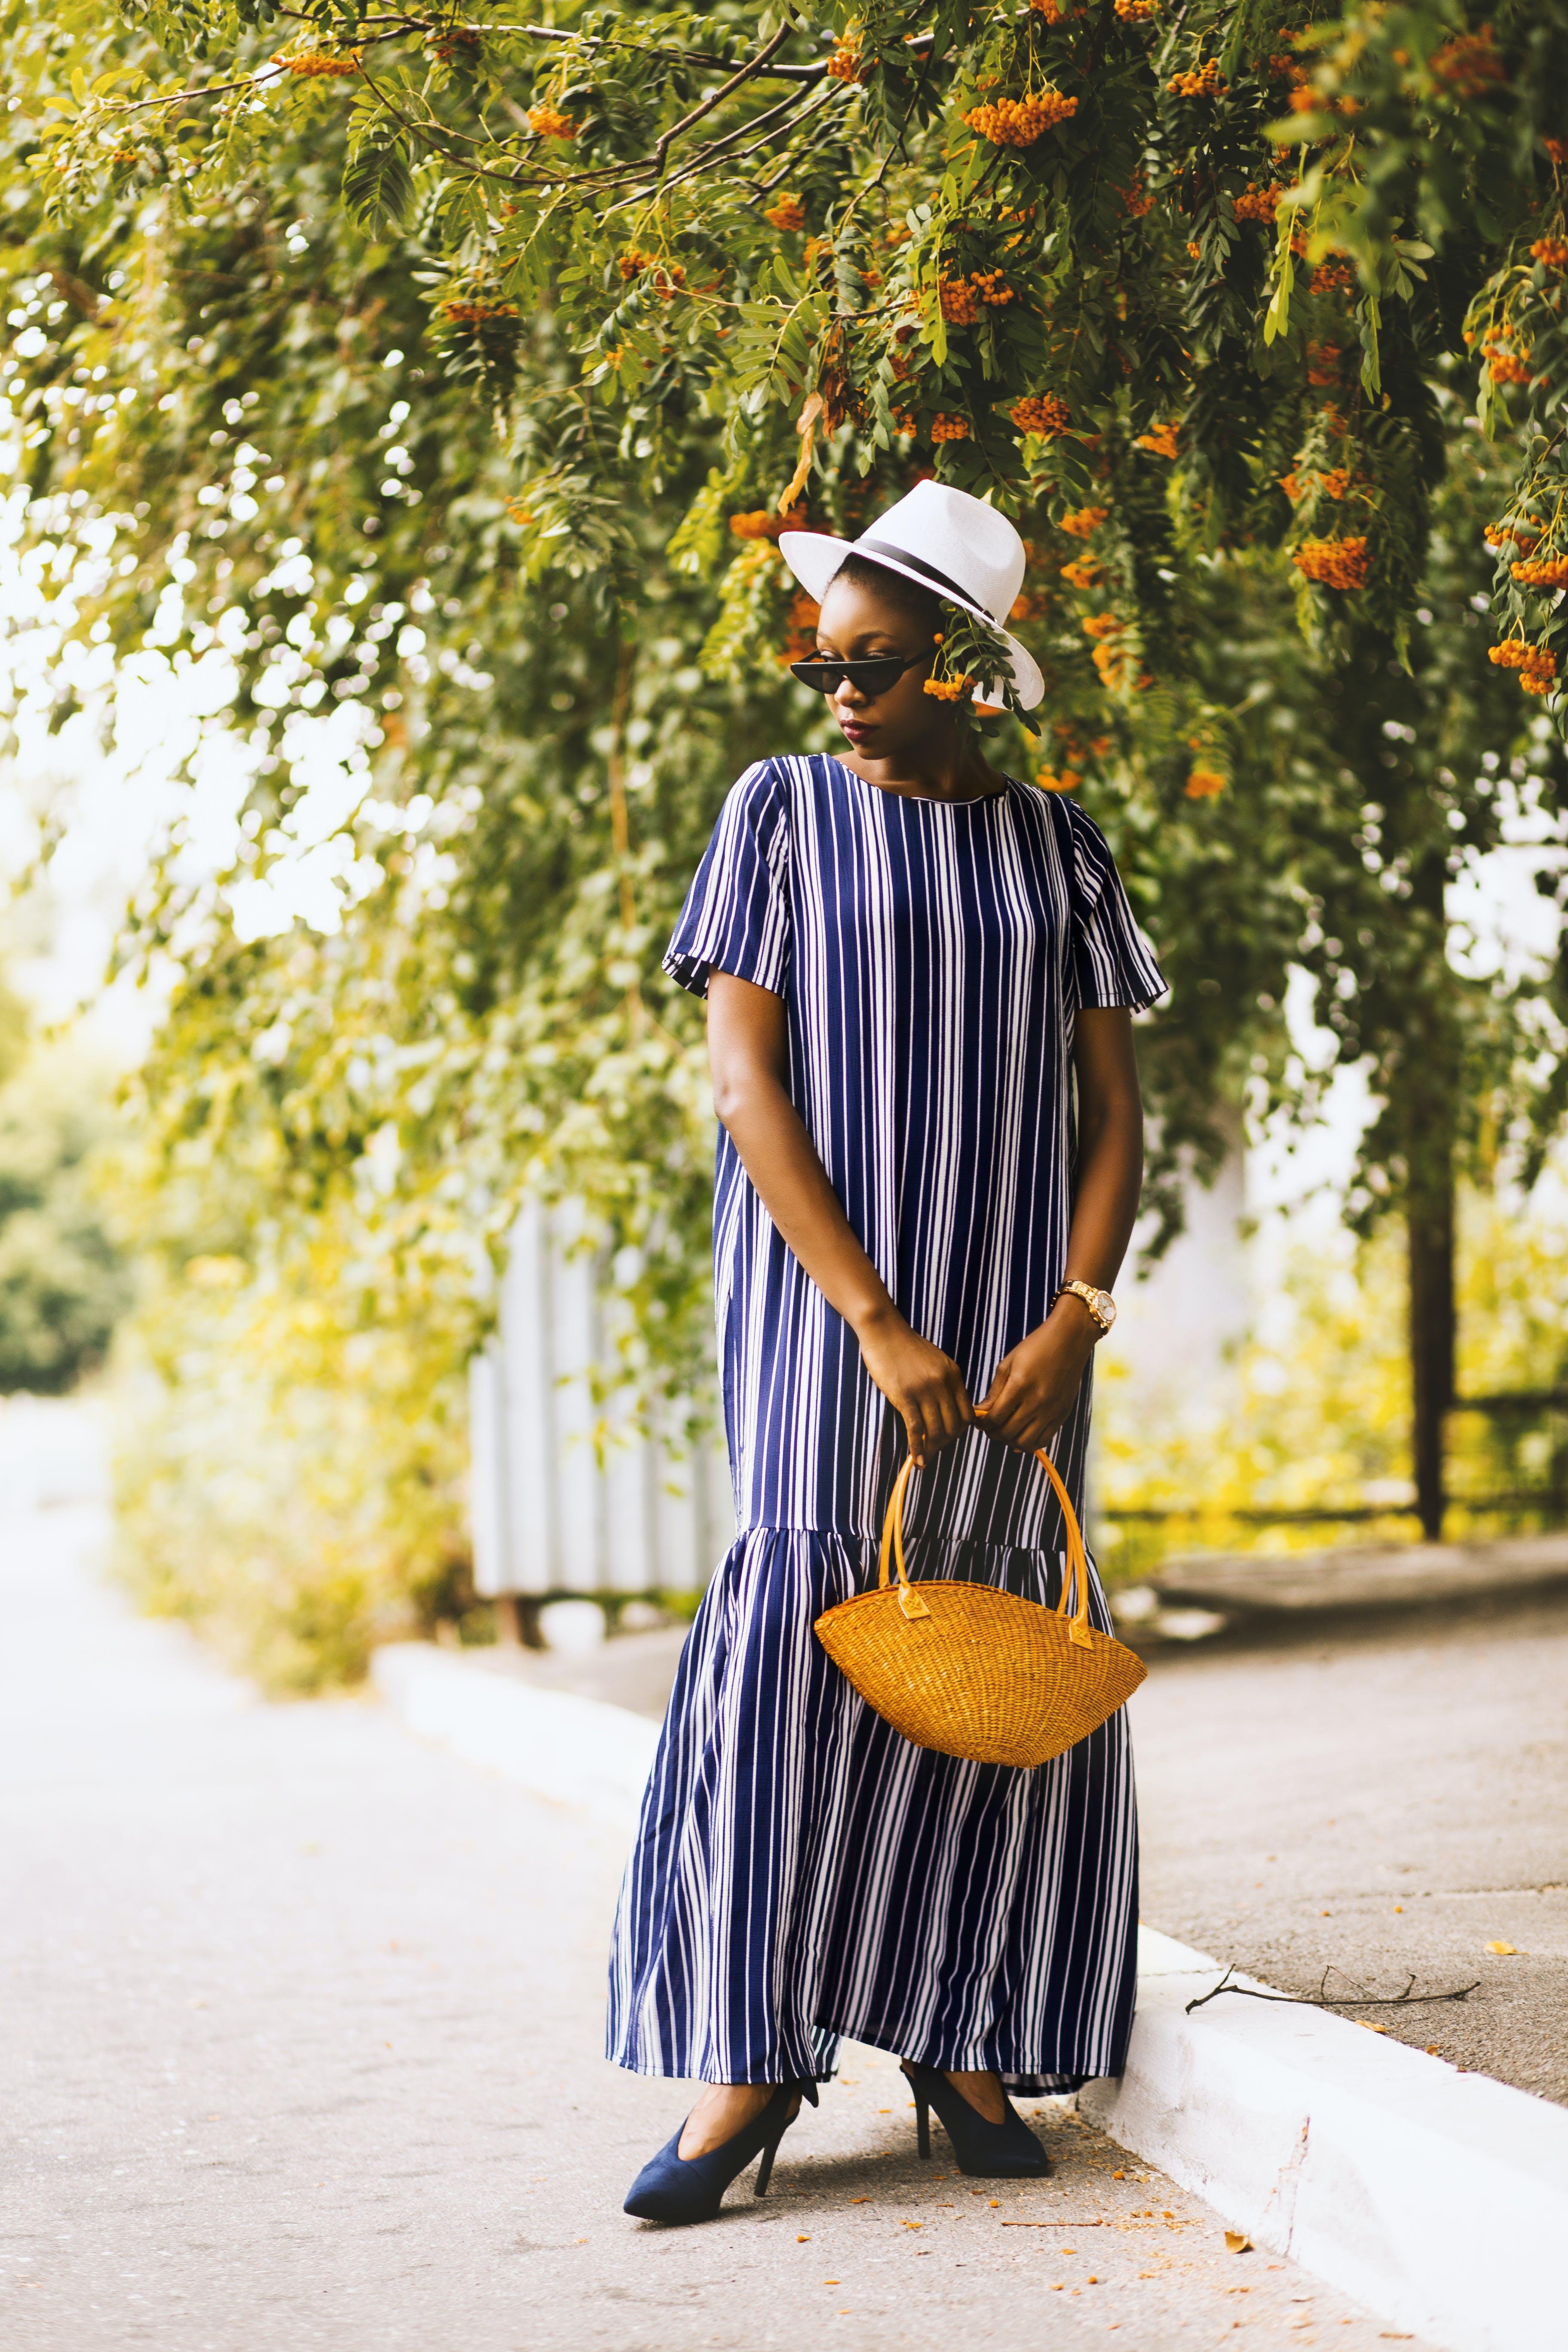 Woman Wearing Dress Holding Basket